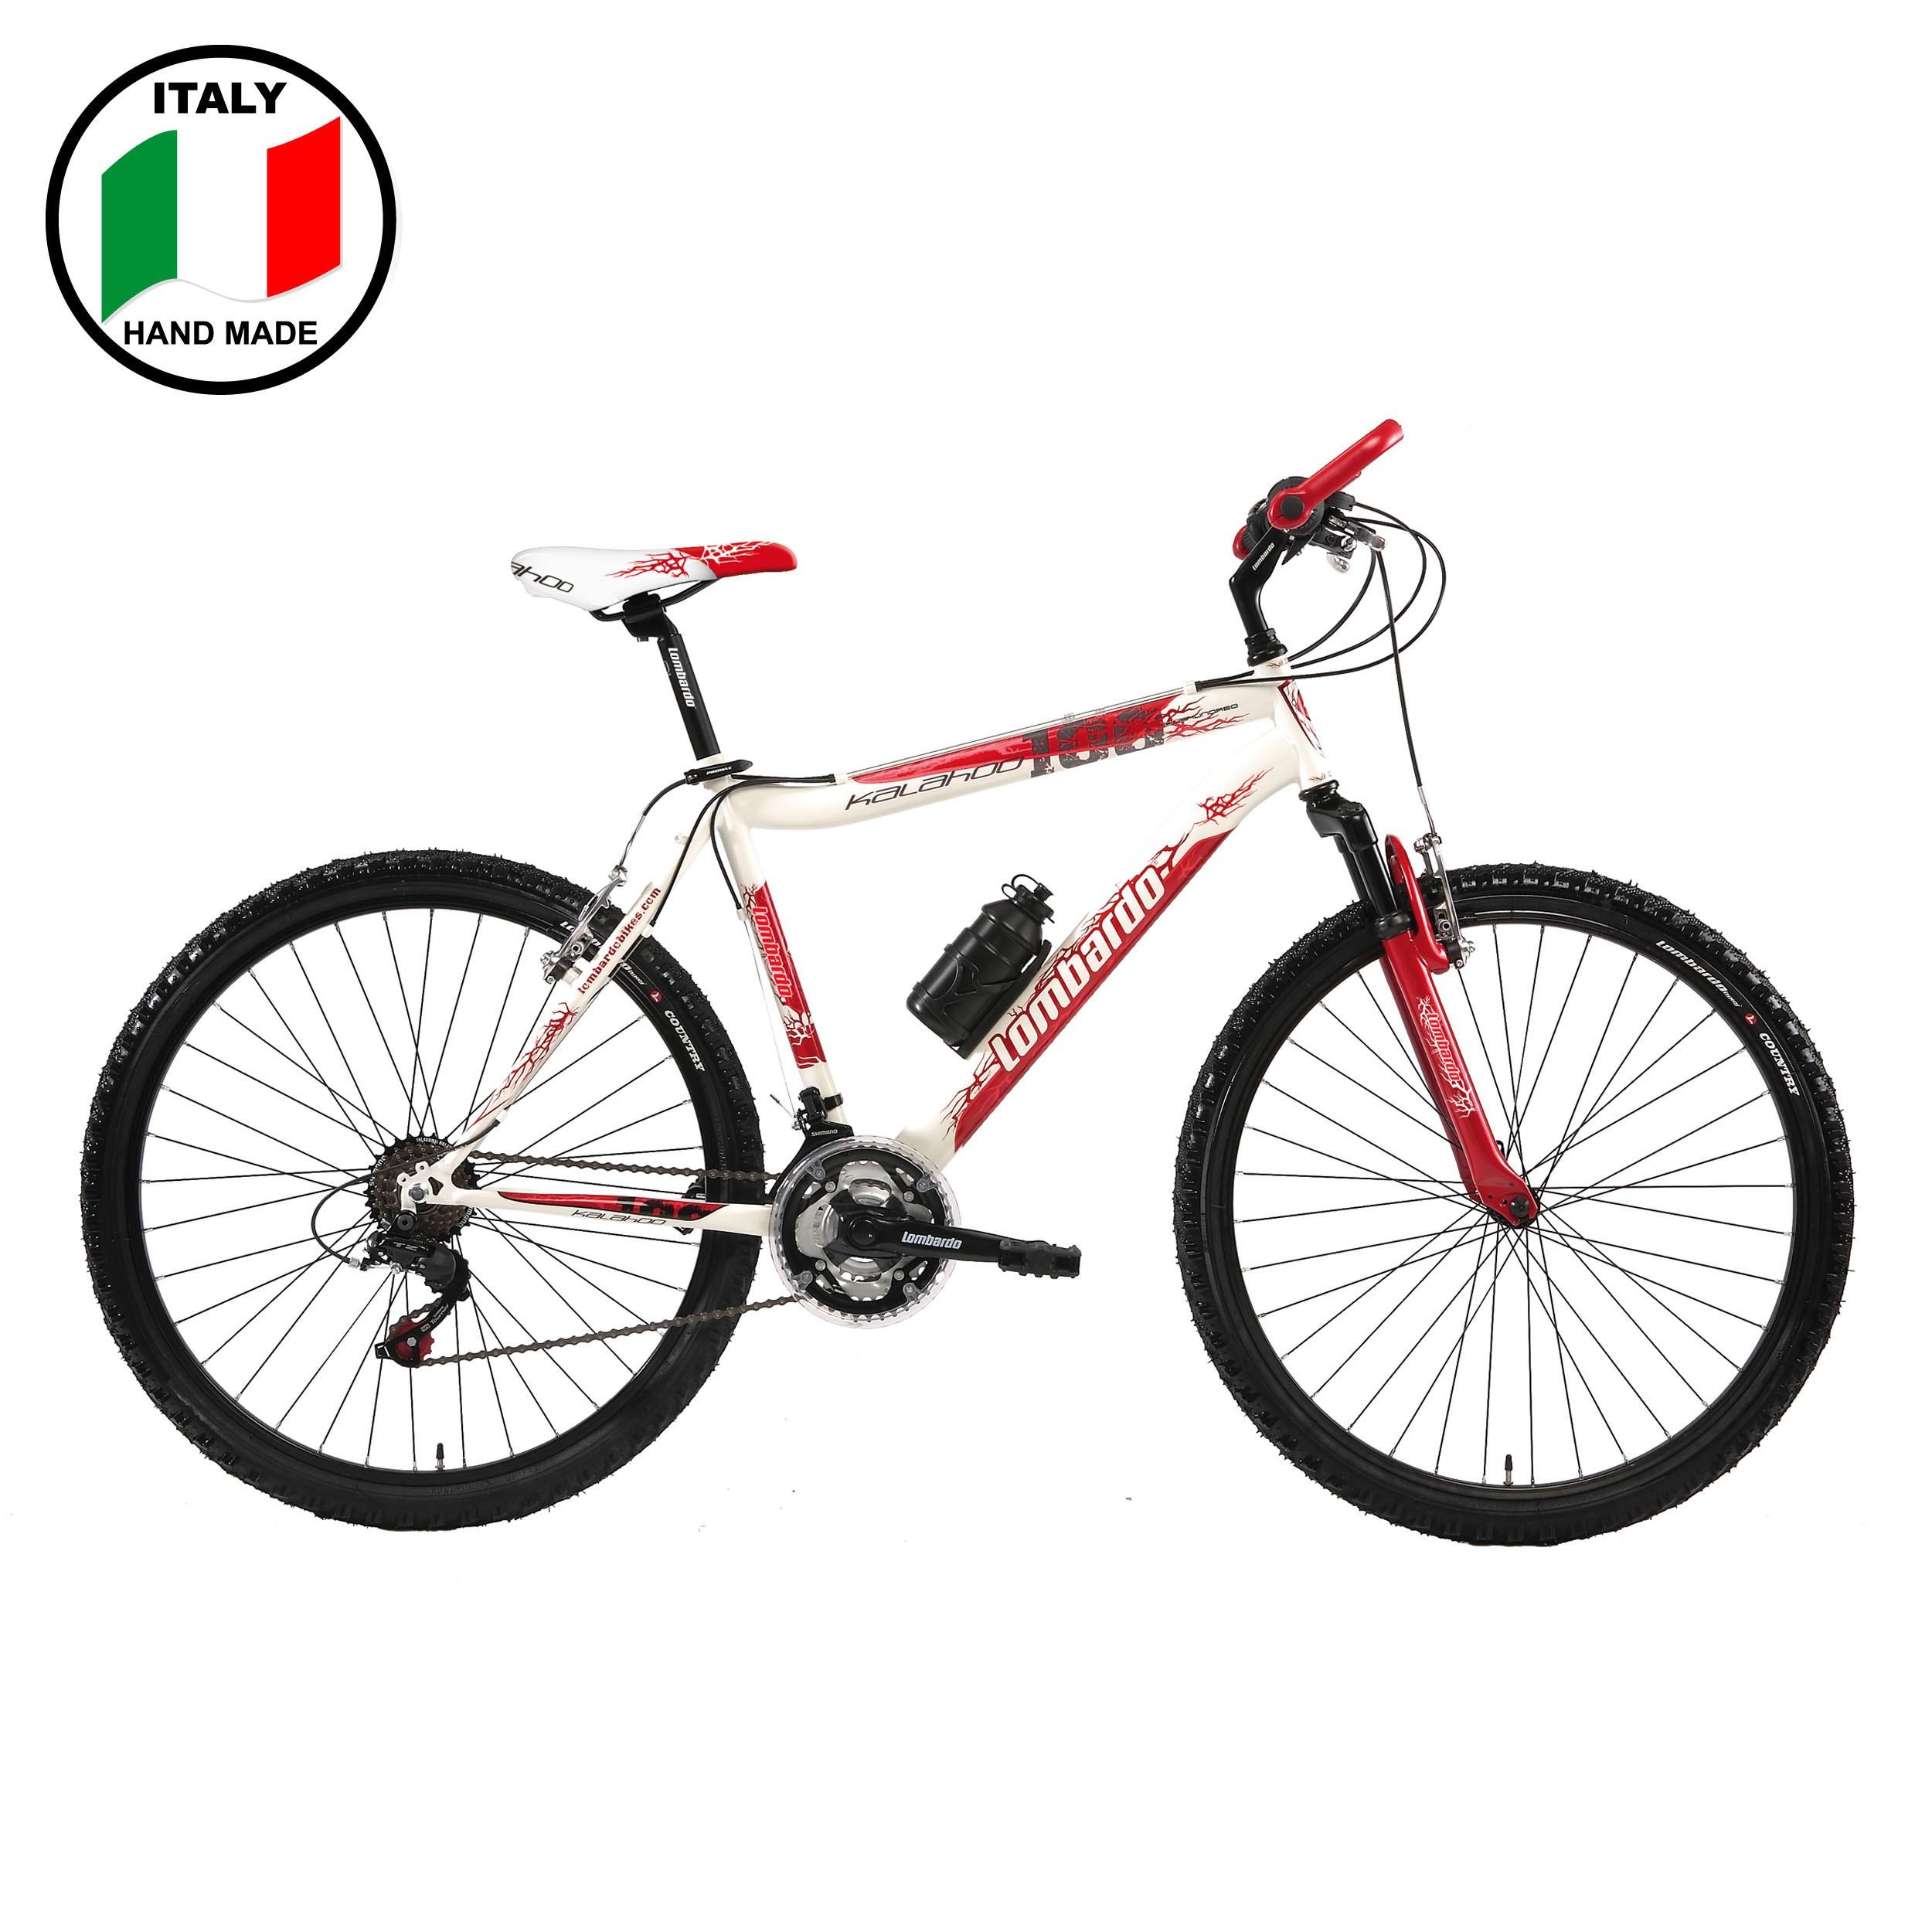 Lombardo Kalahoo  26 inch Men's Bike- Red and White